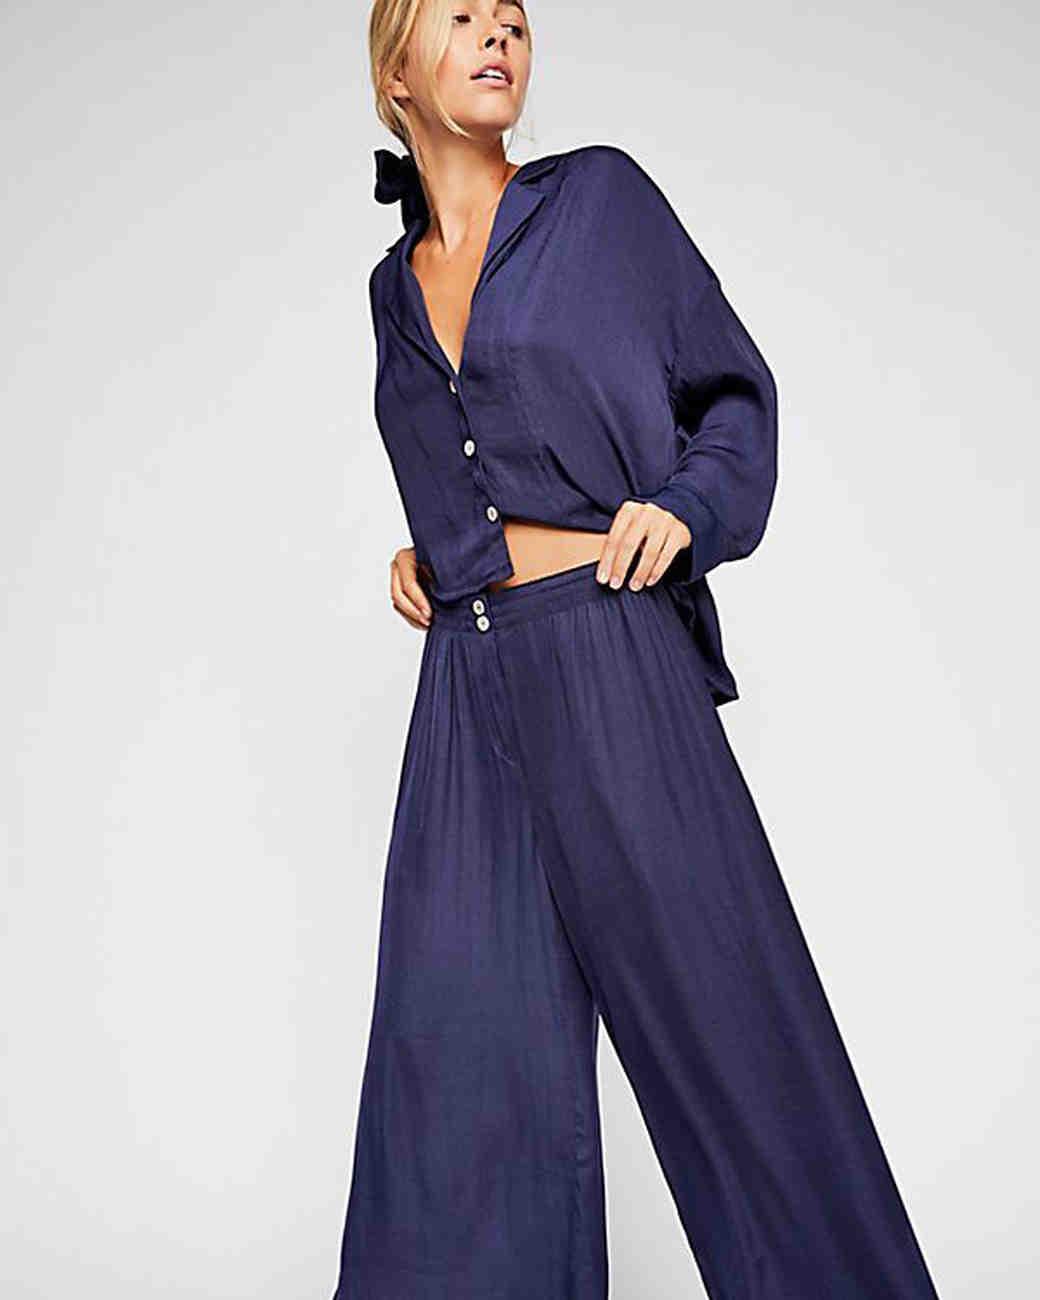 bridesmaid robe alternatives free people lounge pants